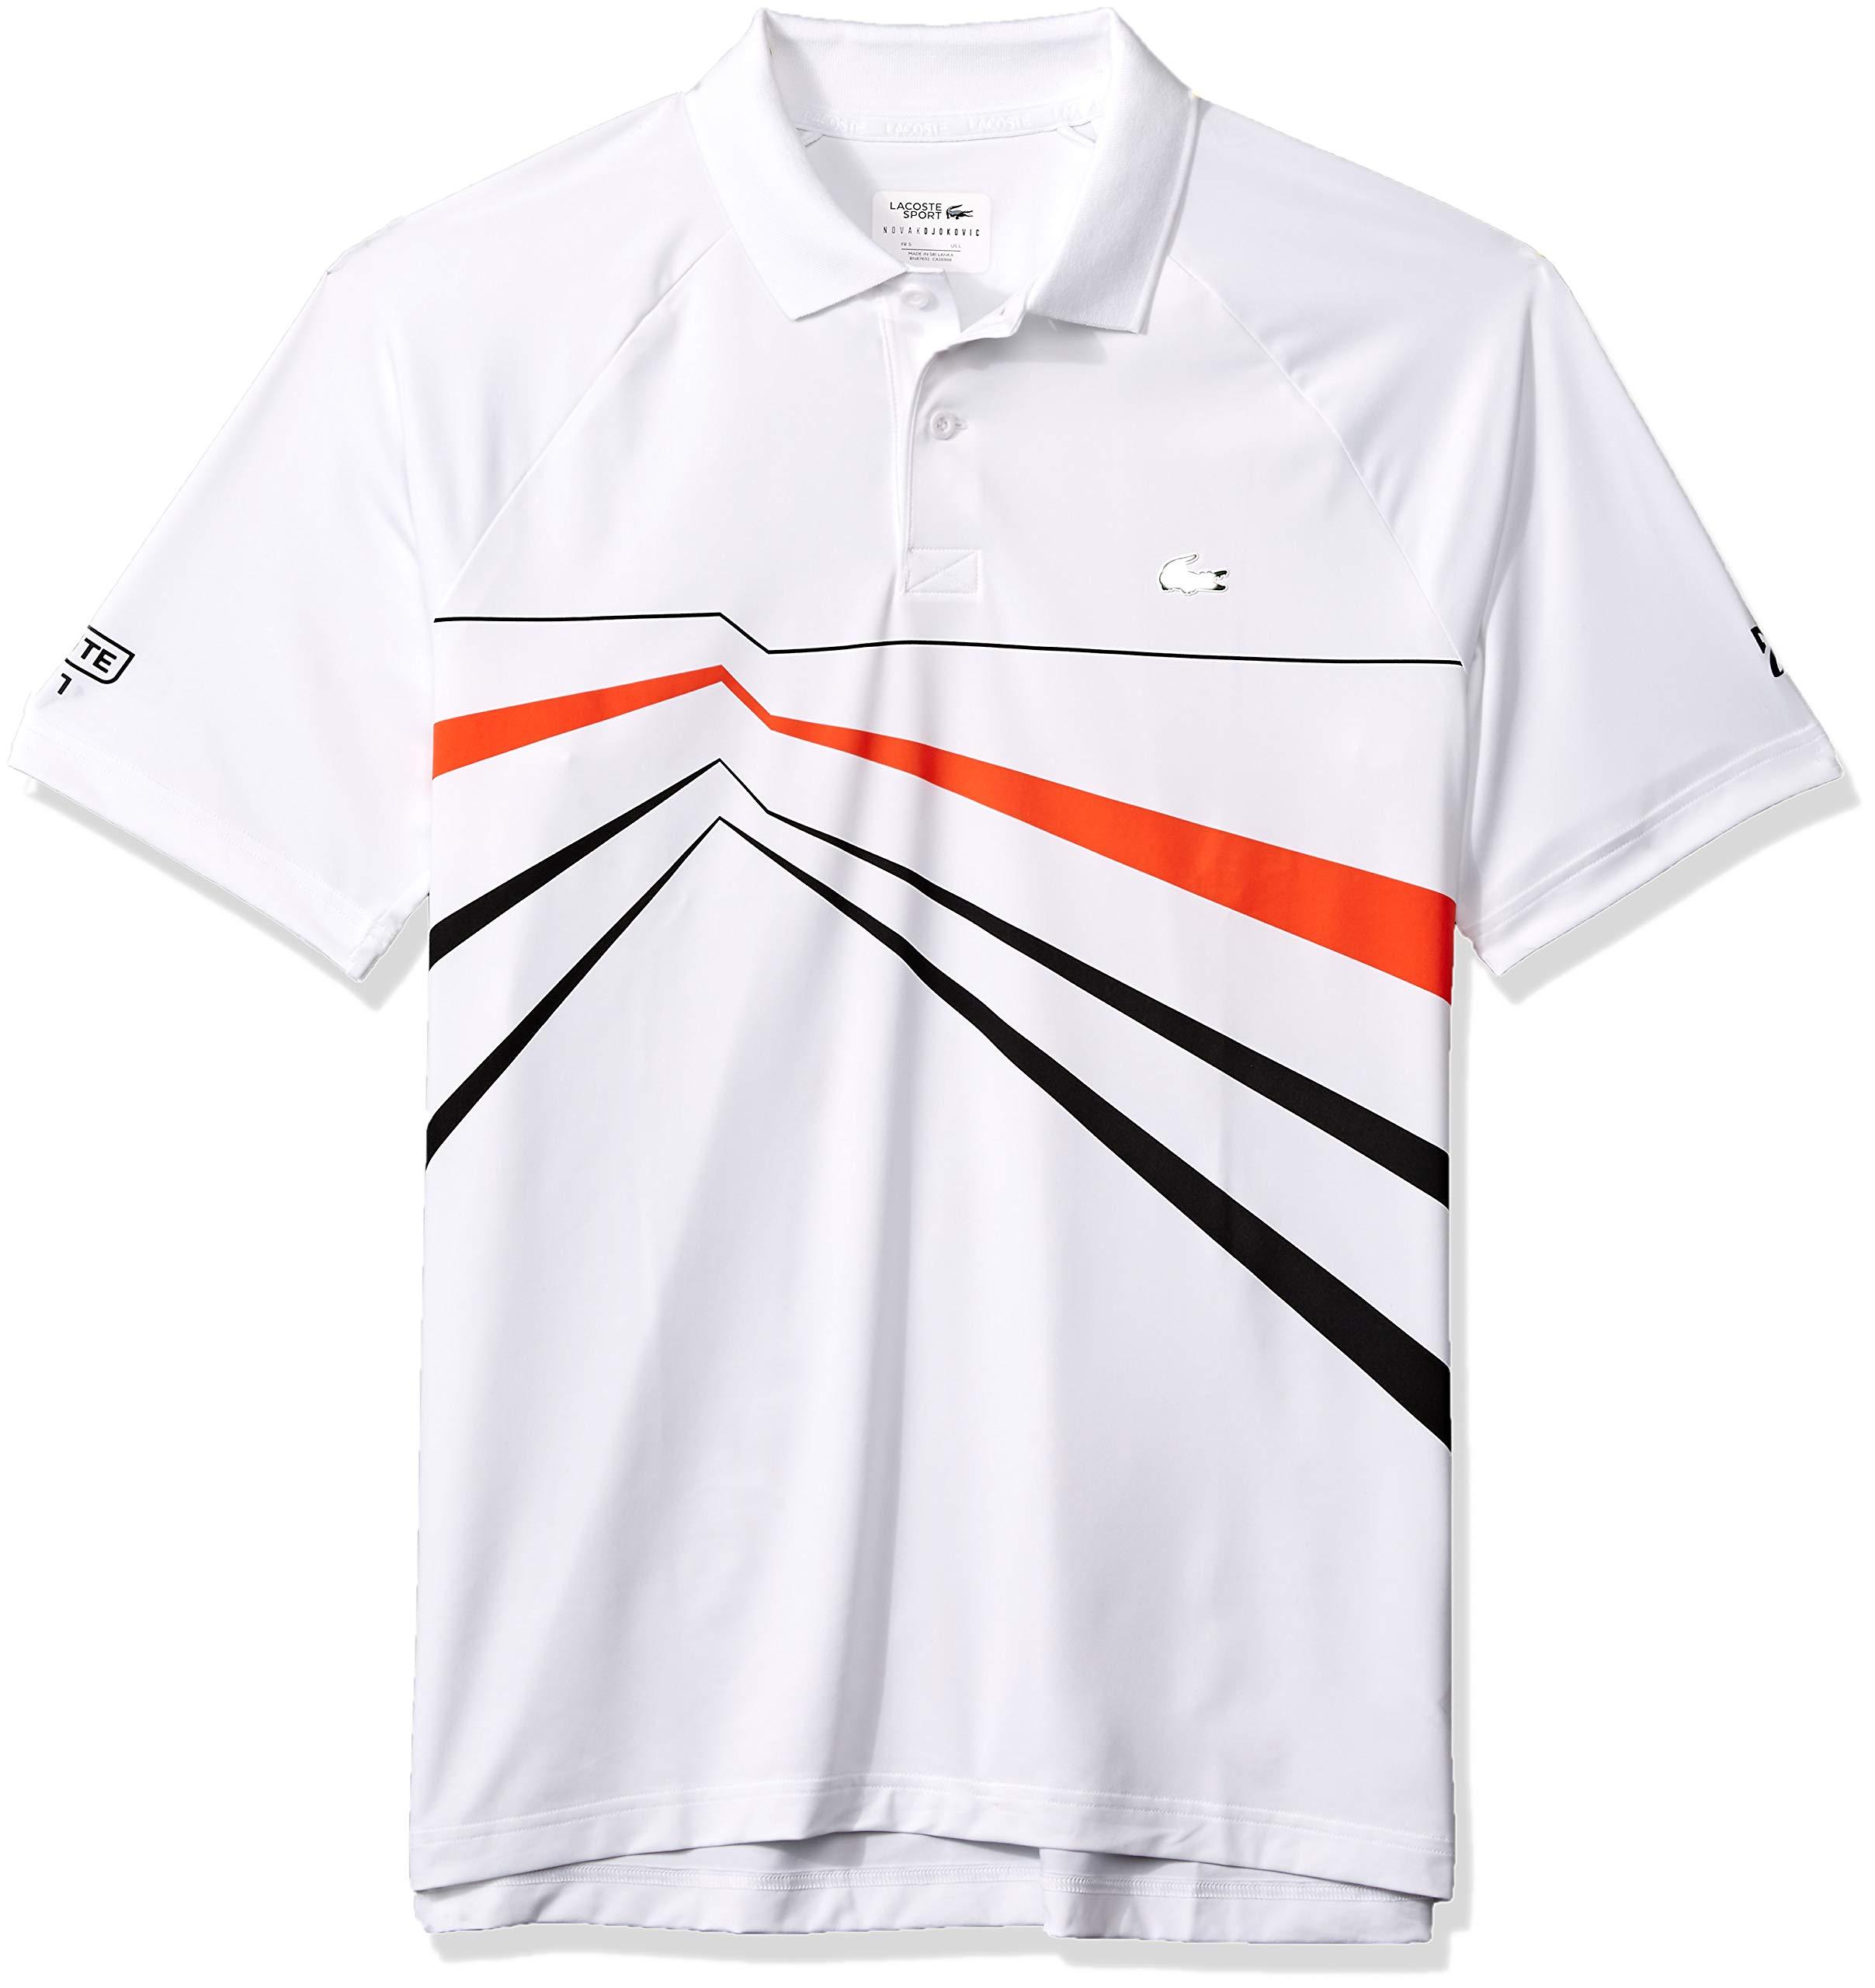 6673cd0b Lacoste Men's Sport DJOVOKIC Short Sleeve Ultra Dry GEO Print Graphic Polo,  White/Black/Mexico red, Medium